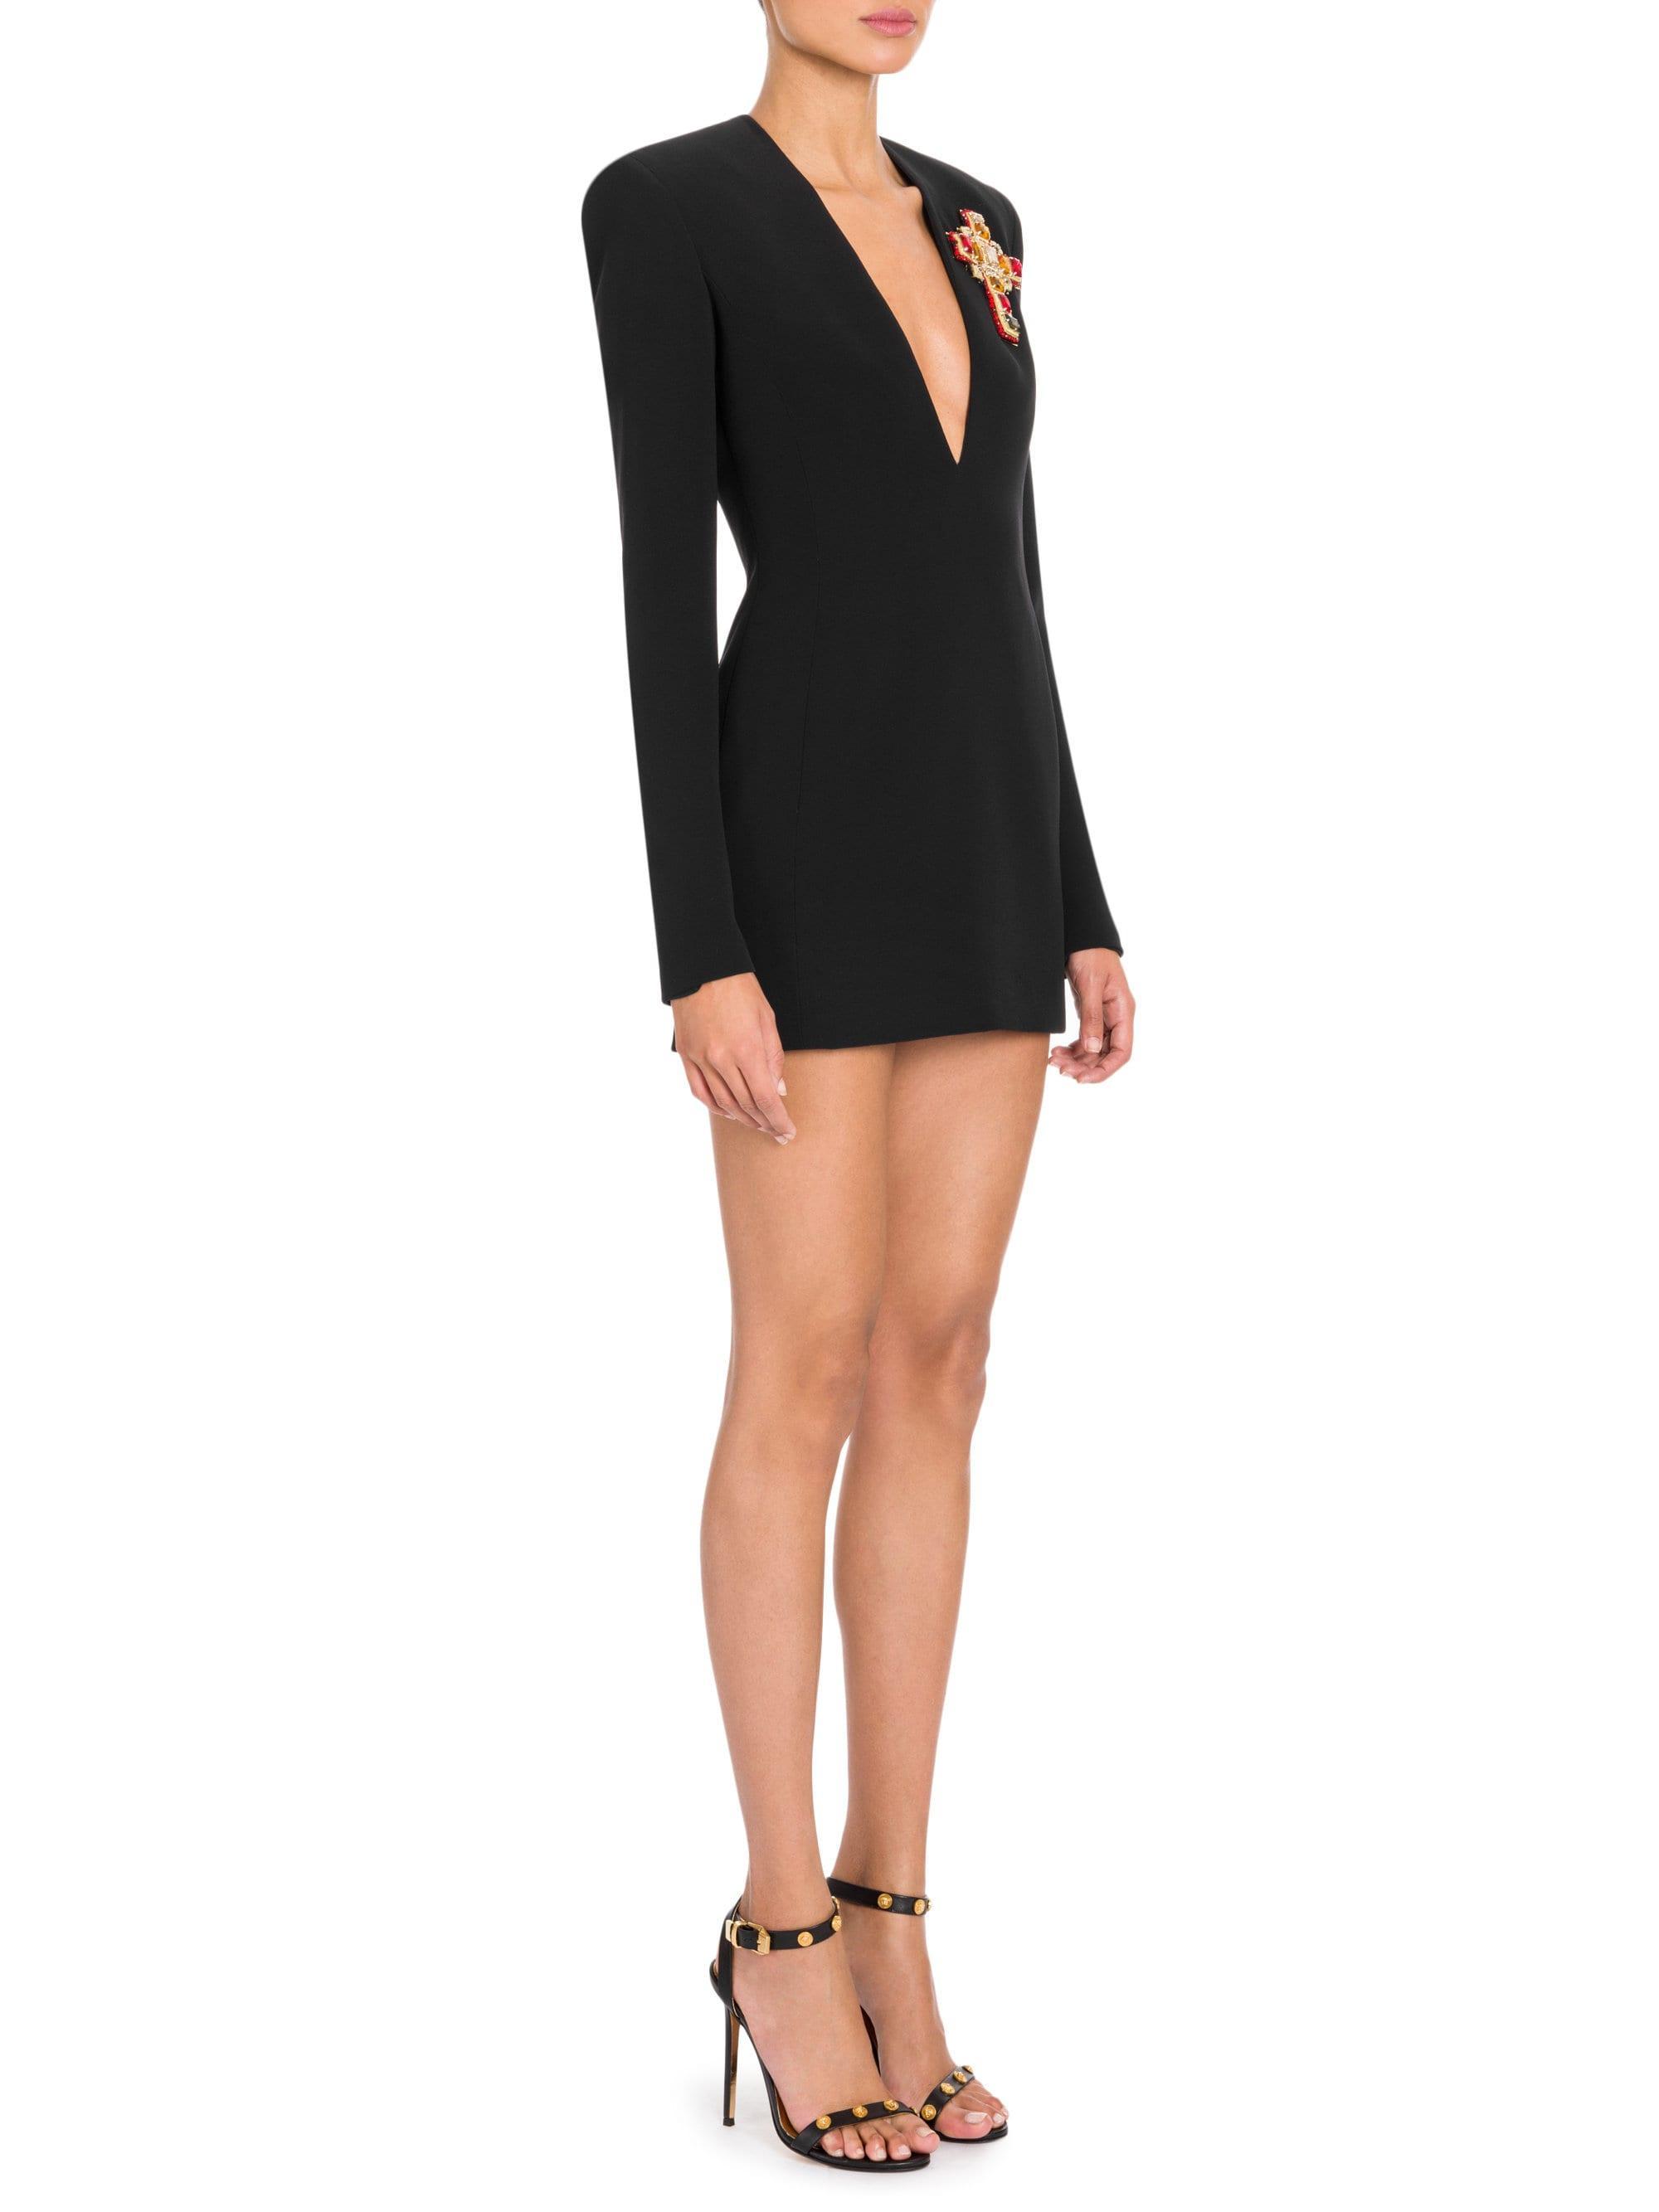 080c074d3b9 Versace V-neck Mini Dress in Black - Lyst